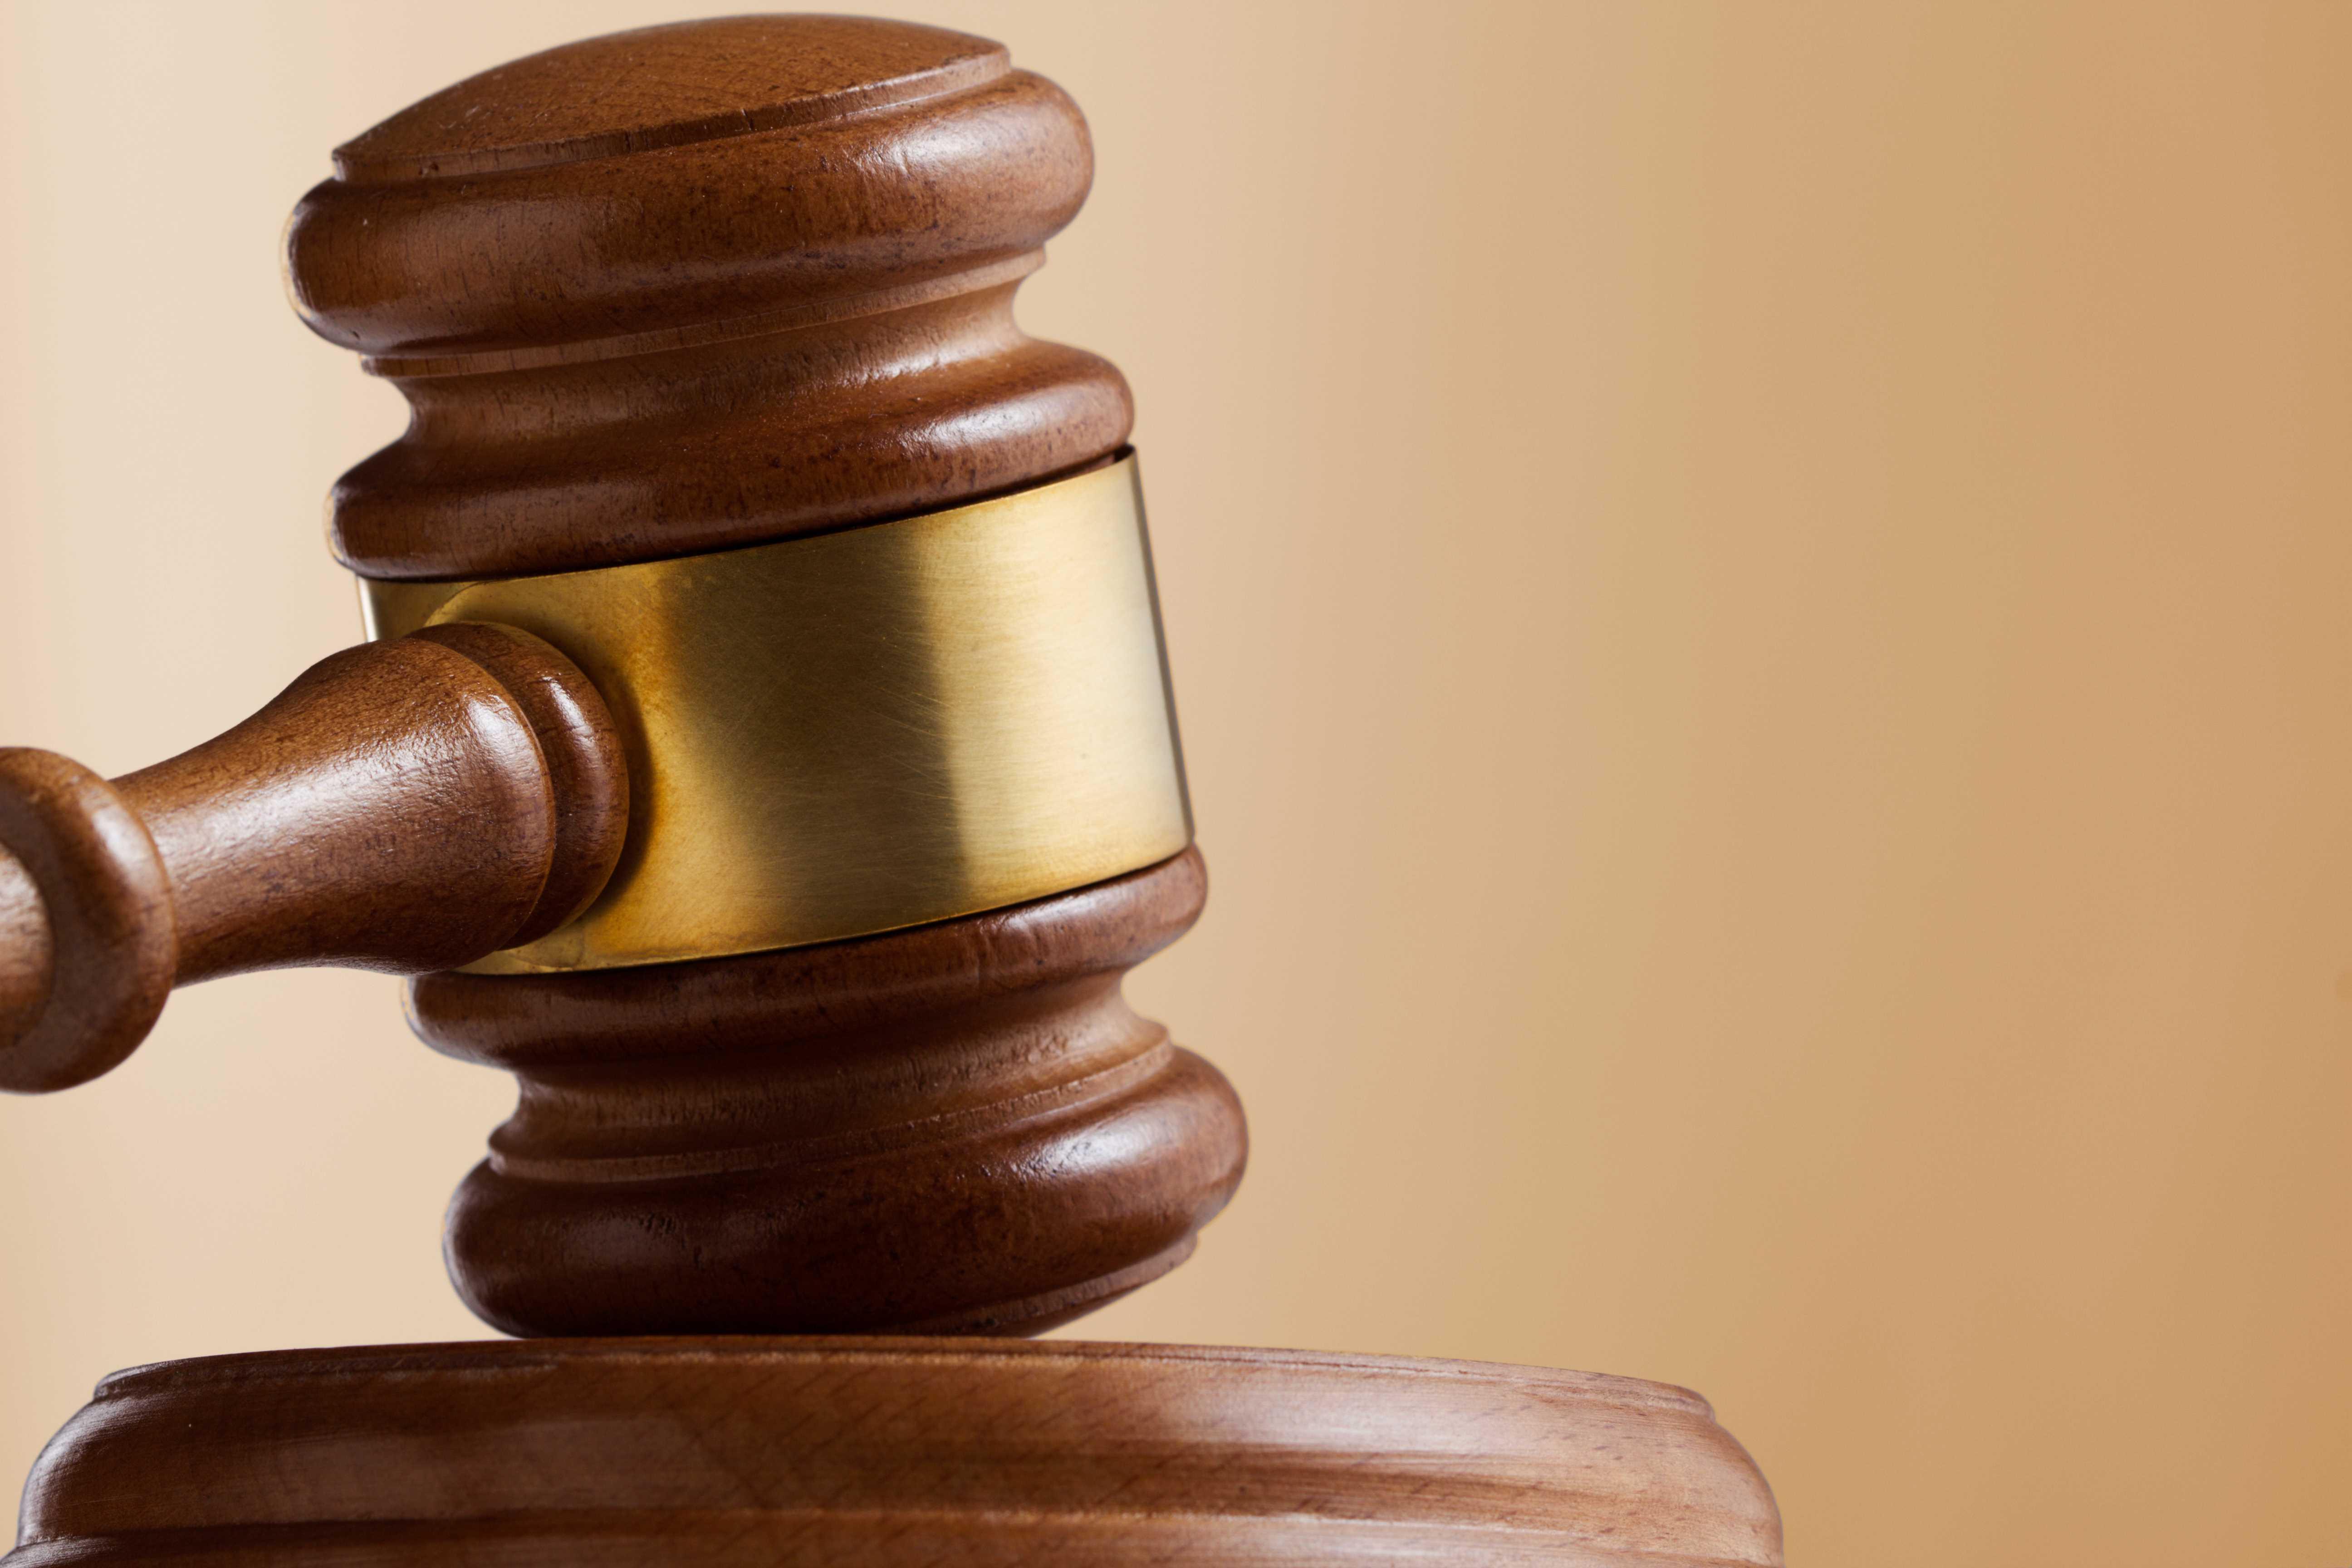 Judge bans Uber's use of background checks